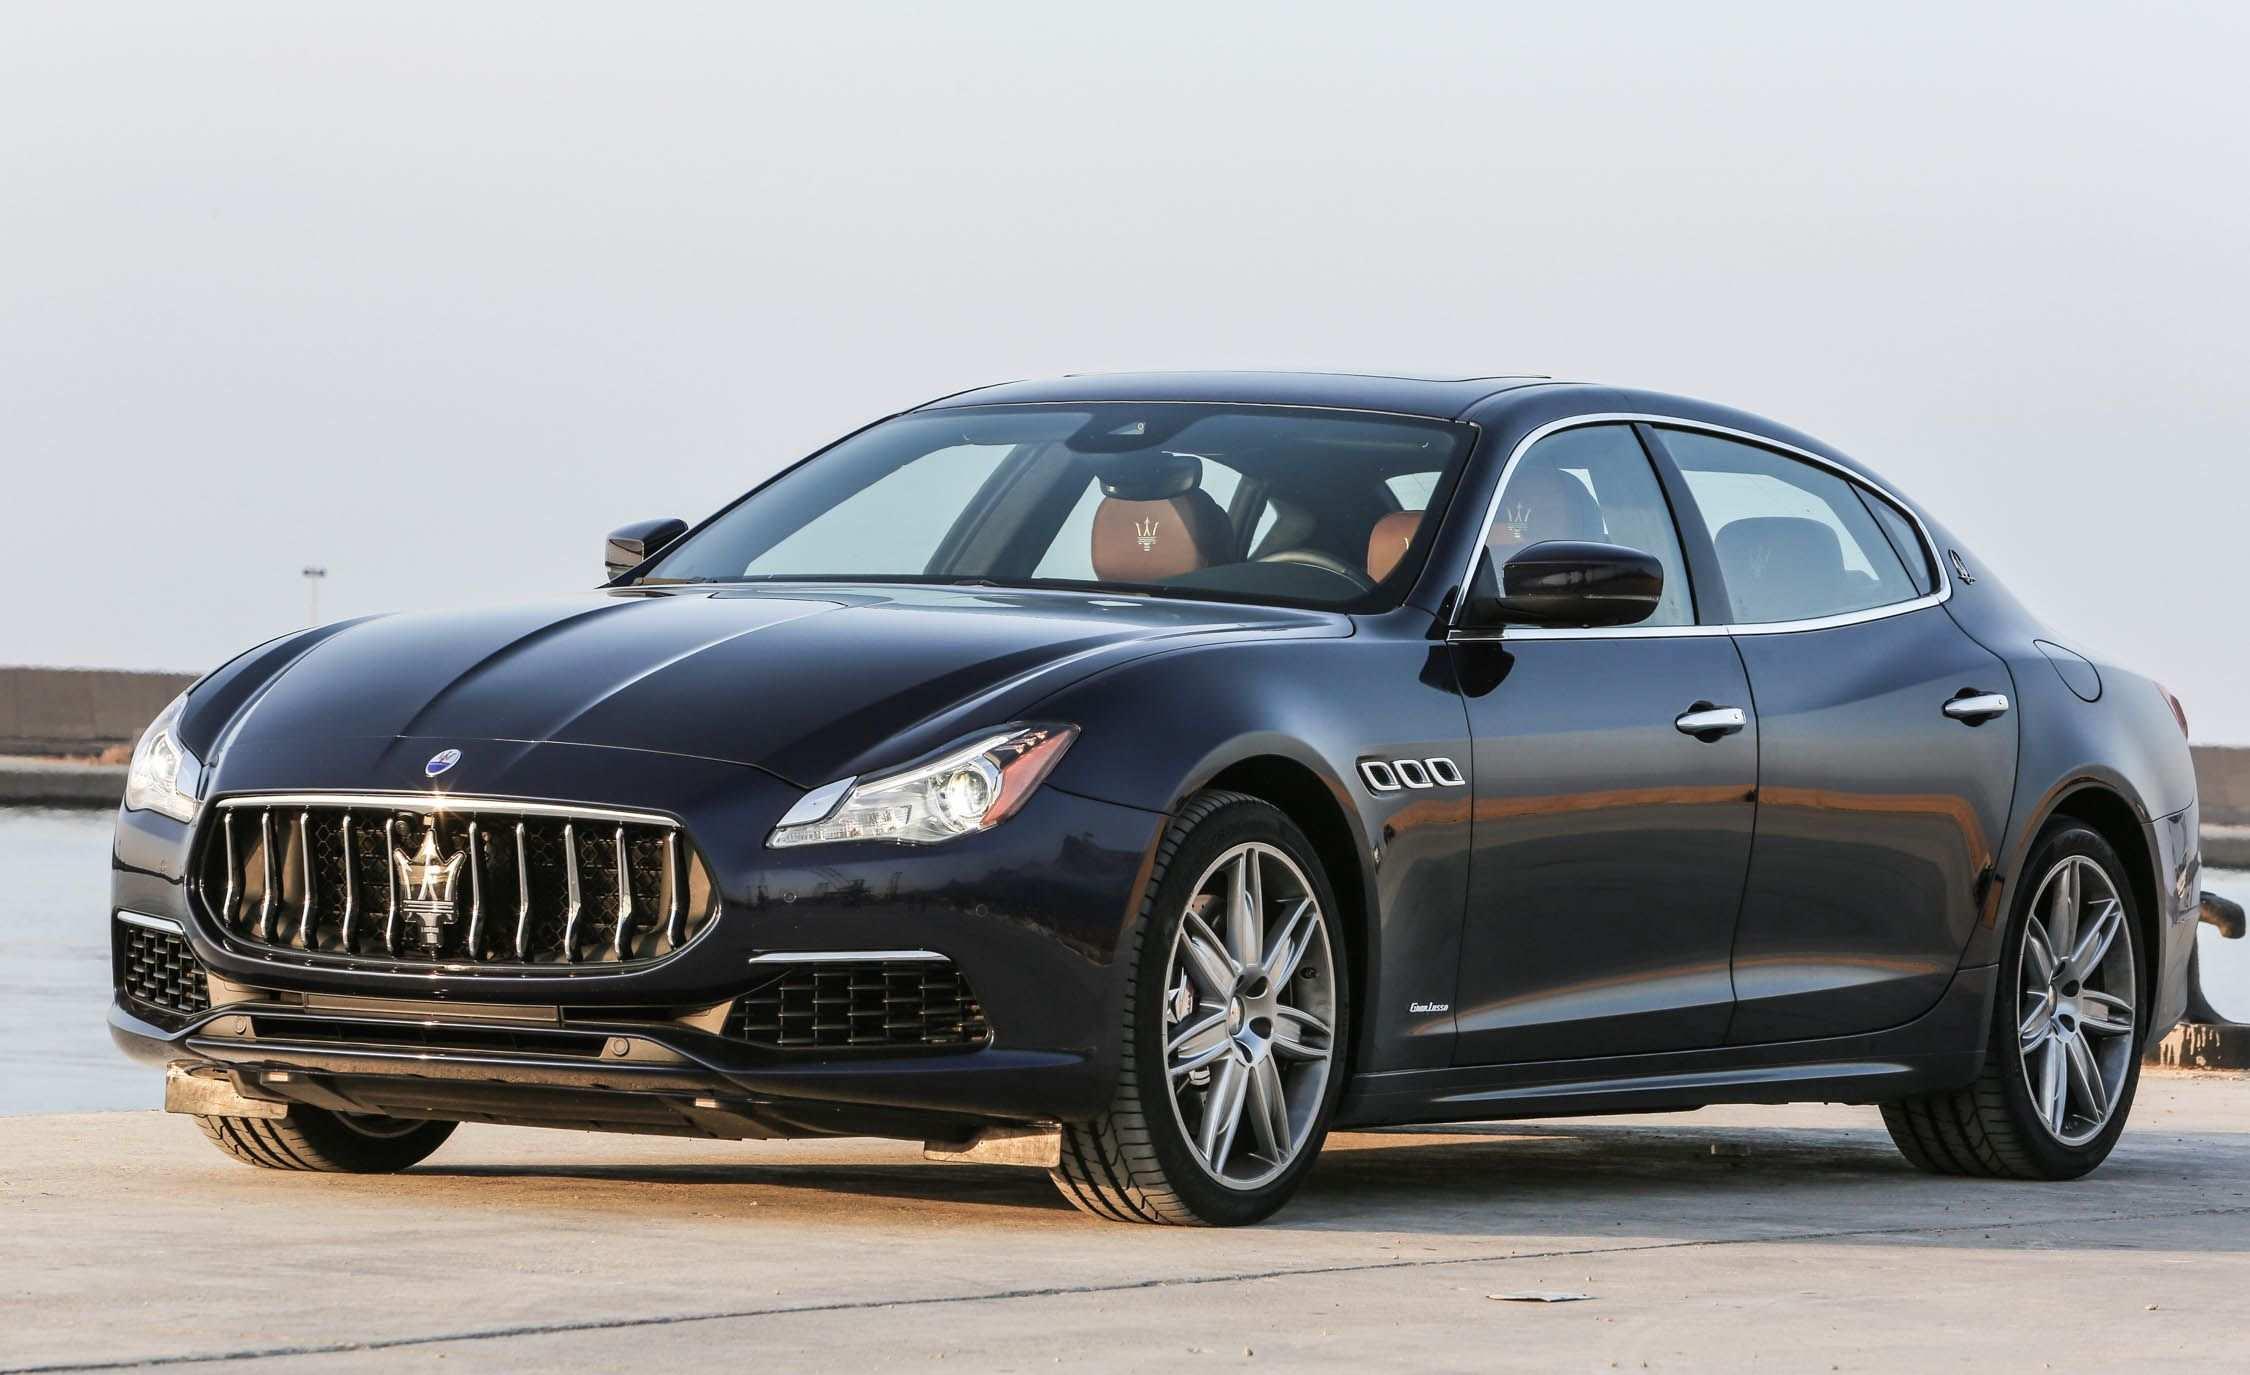 90 Gallery of Maserati Quattroporte Gts 2019 Style with Maserati Quattroporte Gts 2019